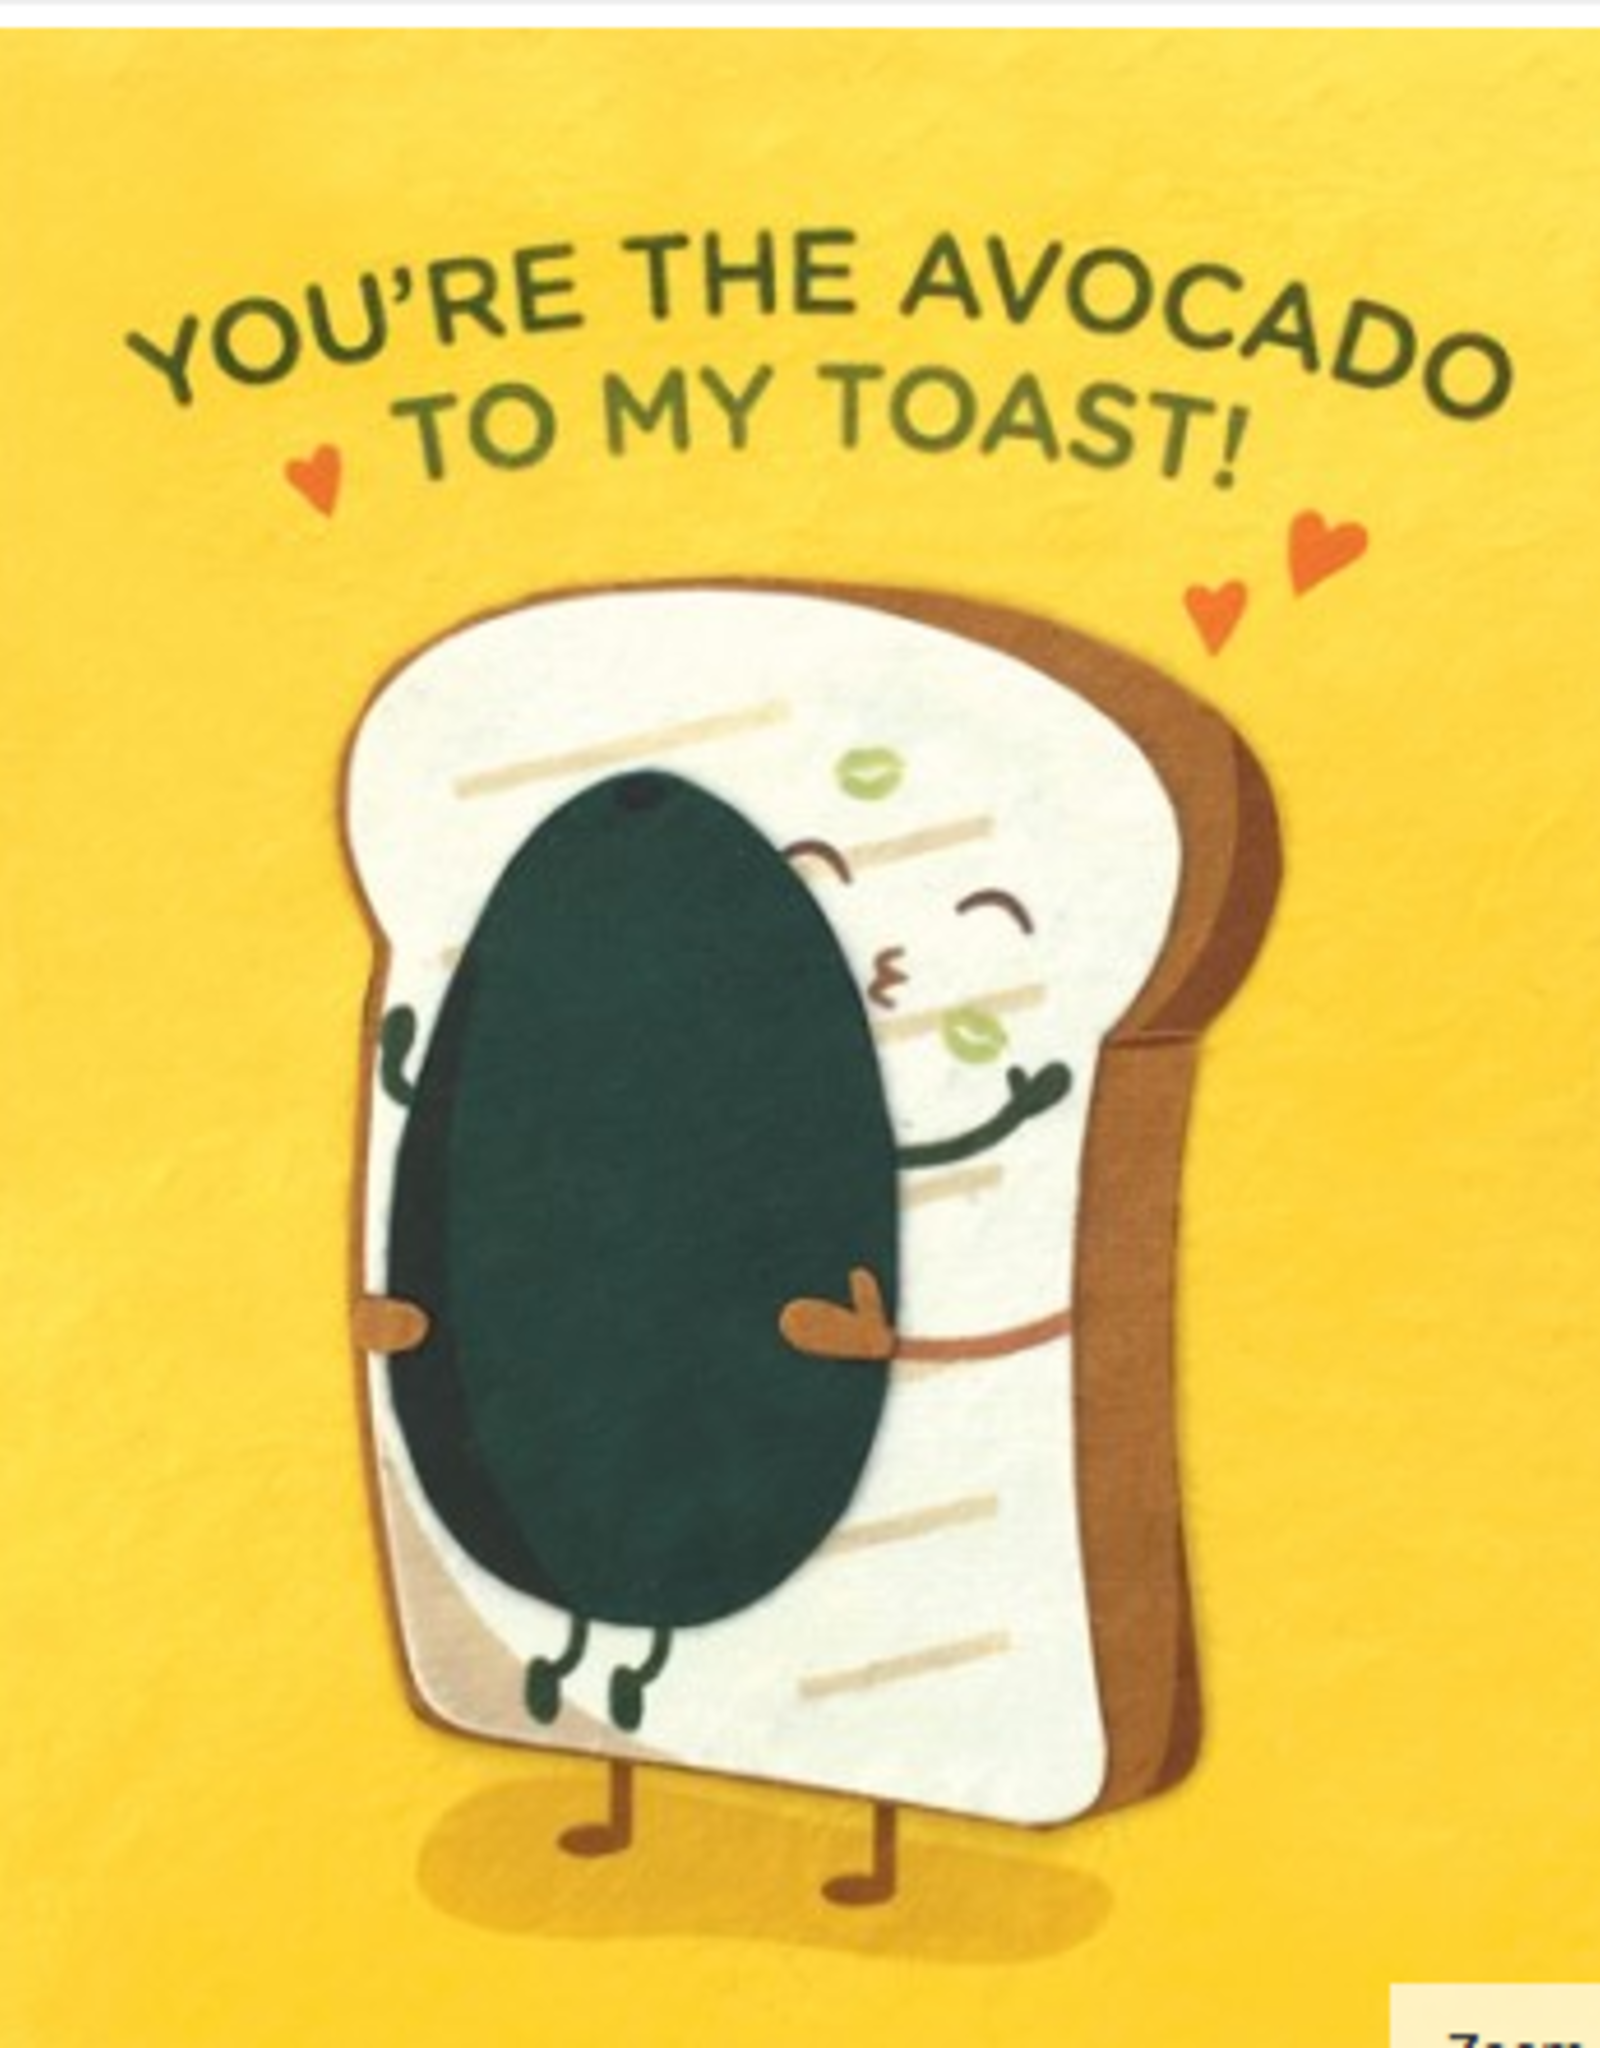 Avocado to My Toast